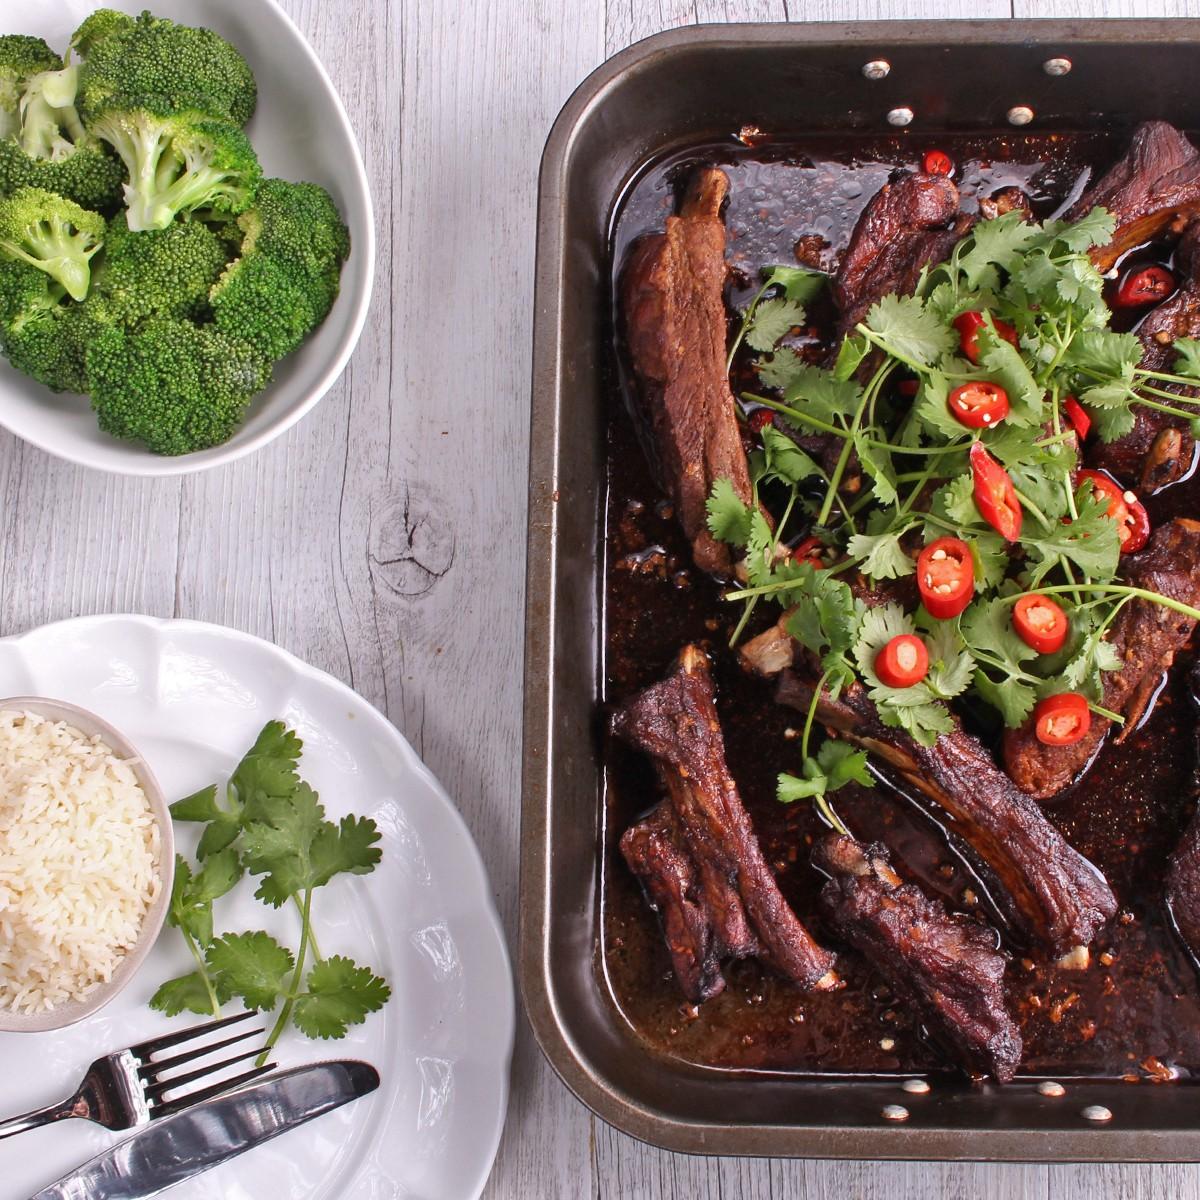 Oven Baked Chinese Five Spice Pork Ribs - SunPork Pork Loin Ribs